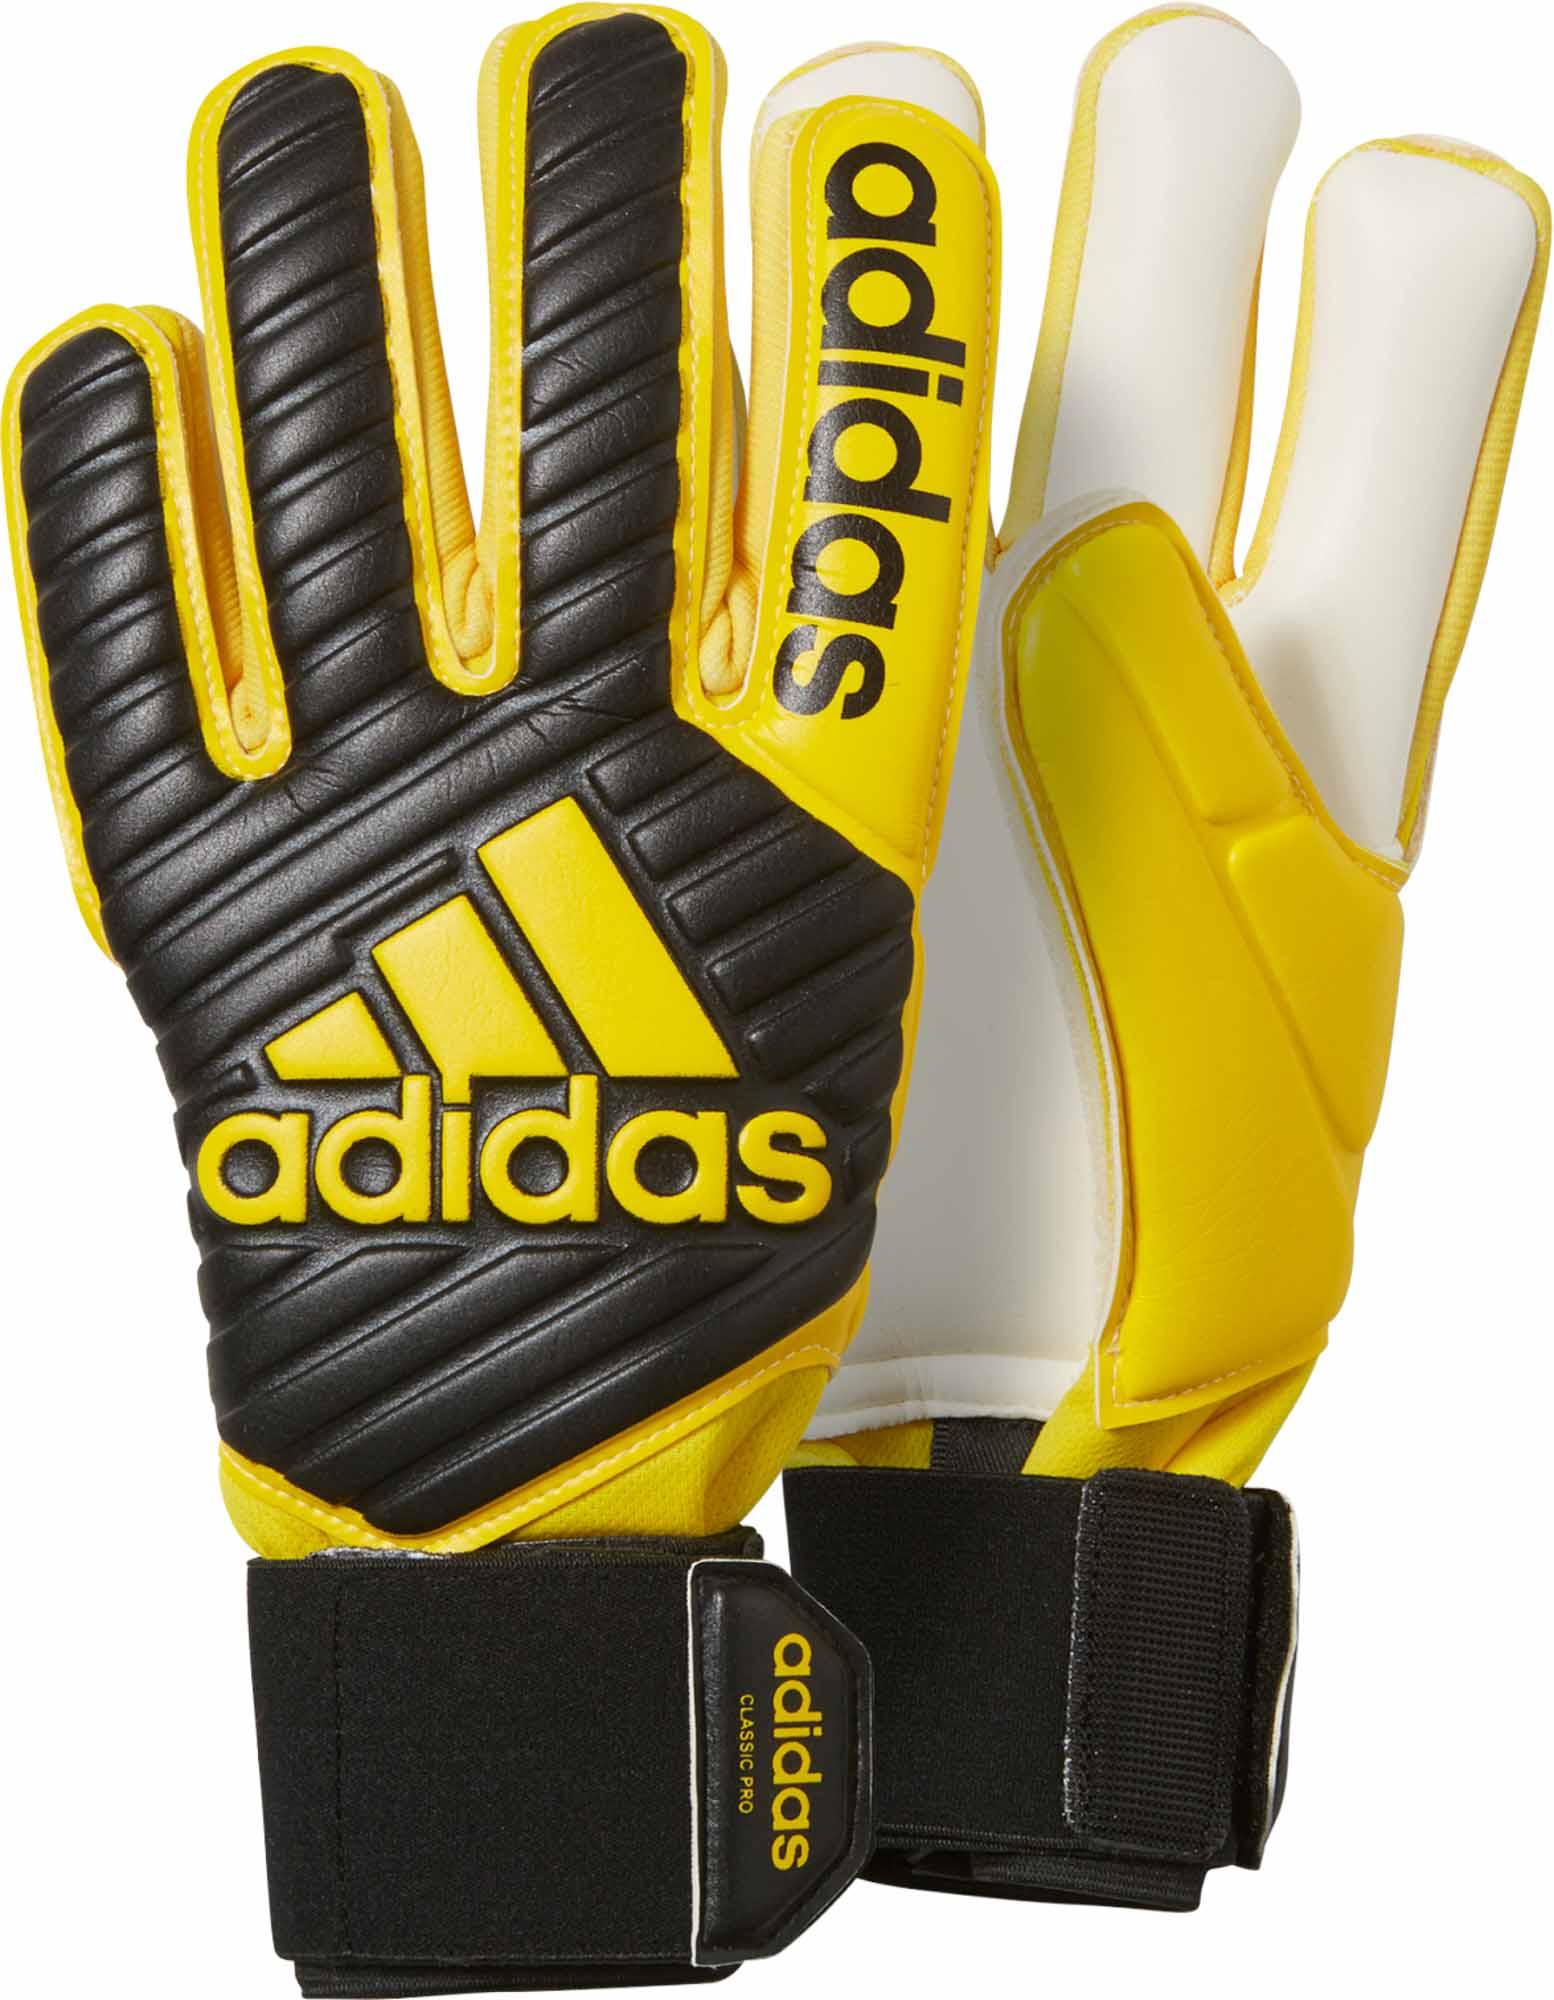 adidas Classic Pro Goalkeeper Gloves Black & Yellow